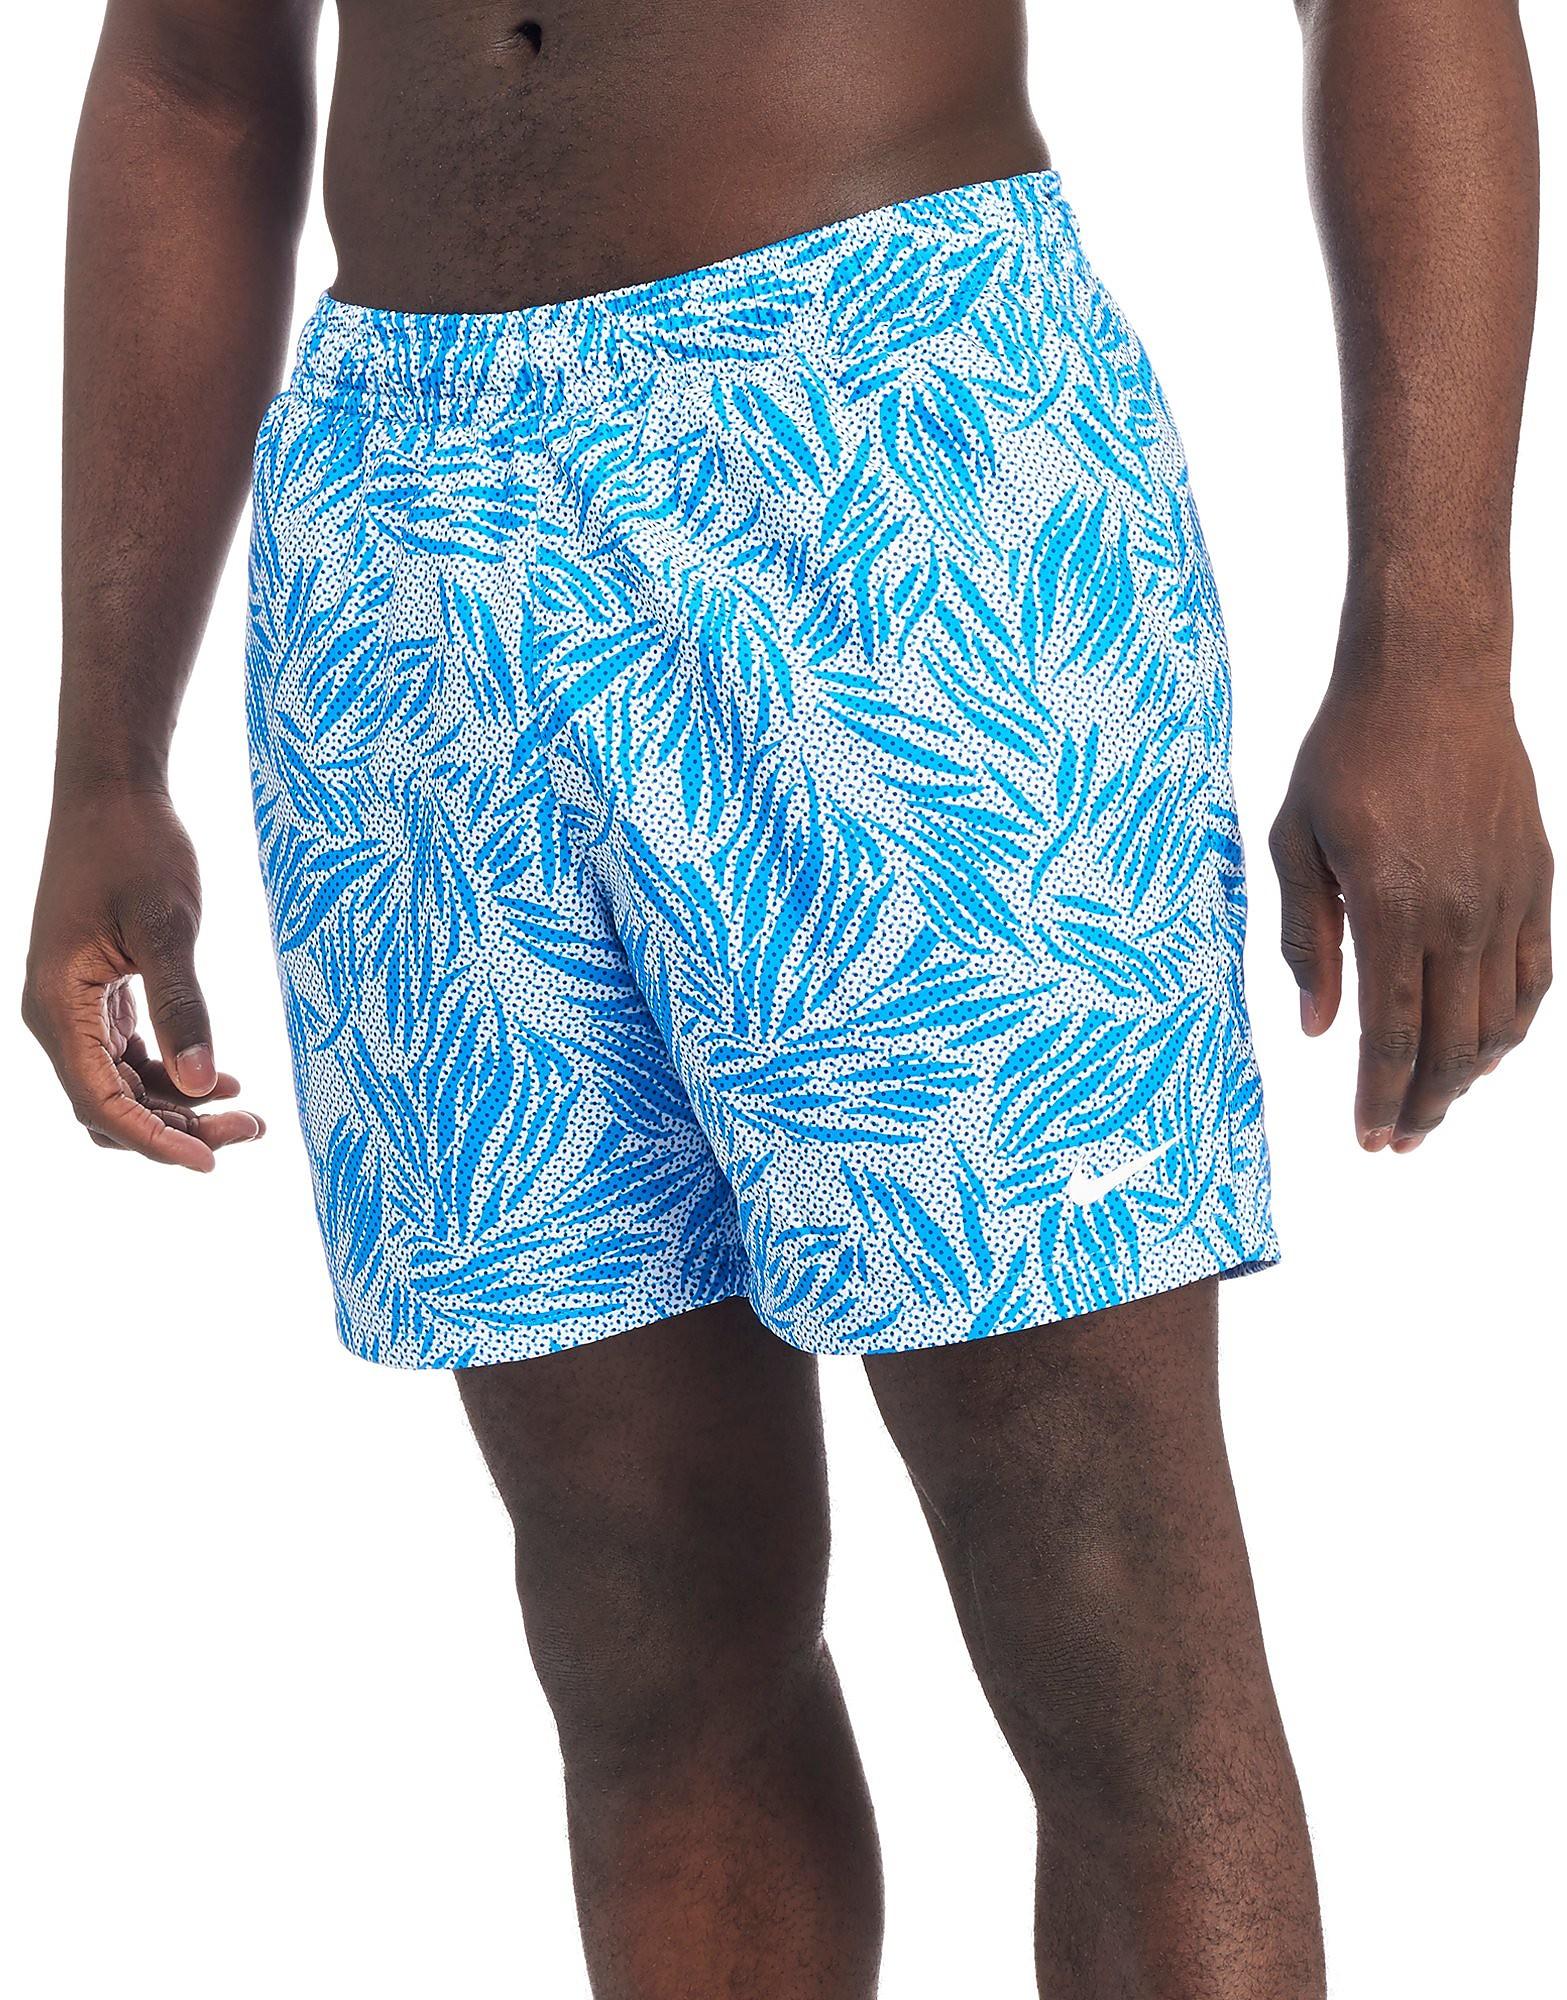 Nike Floral 2 Swim Shorts